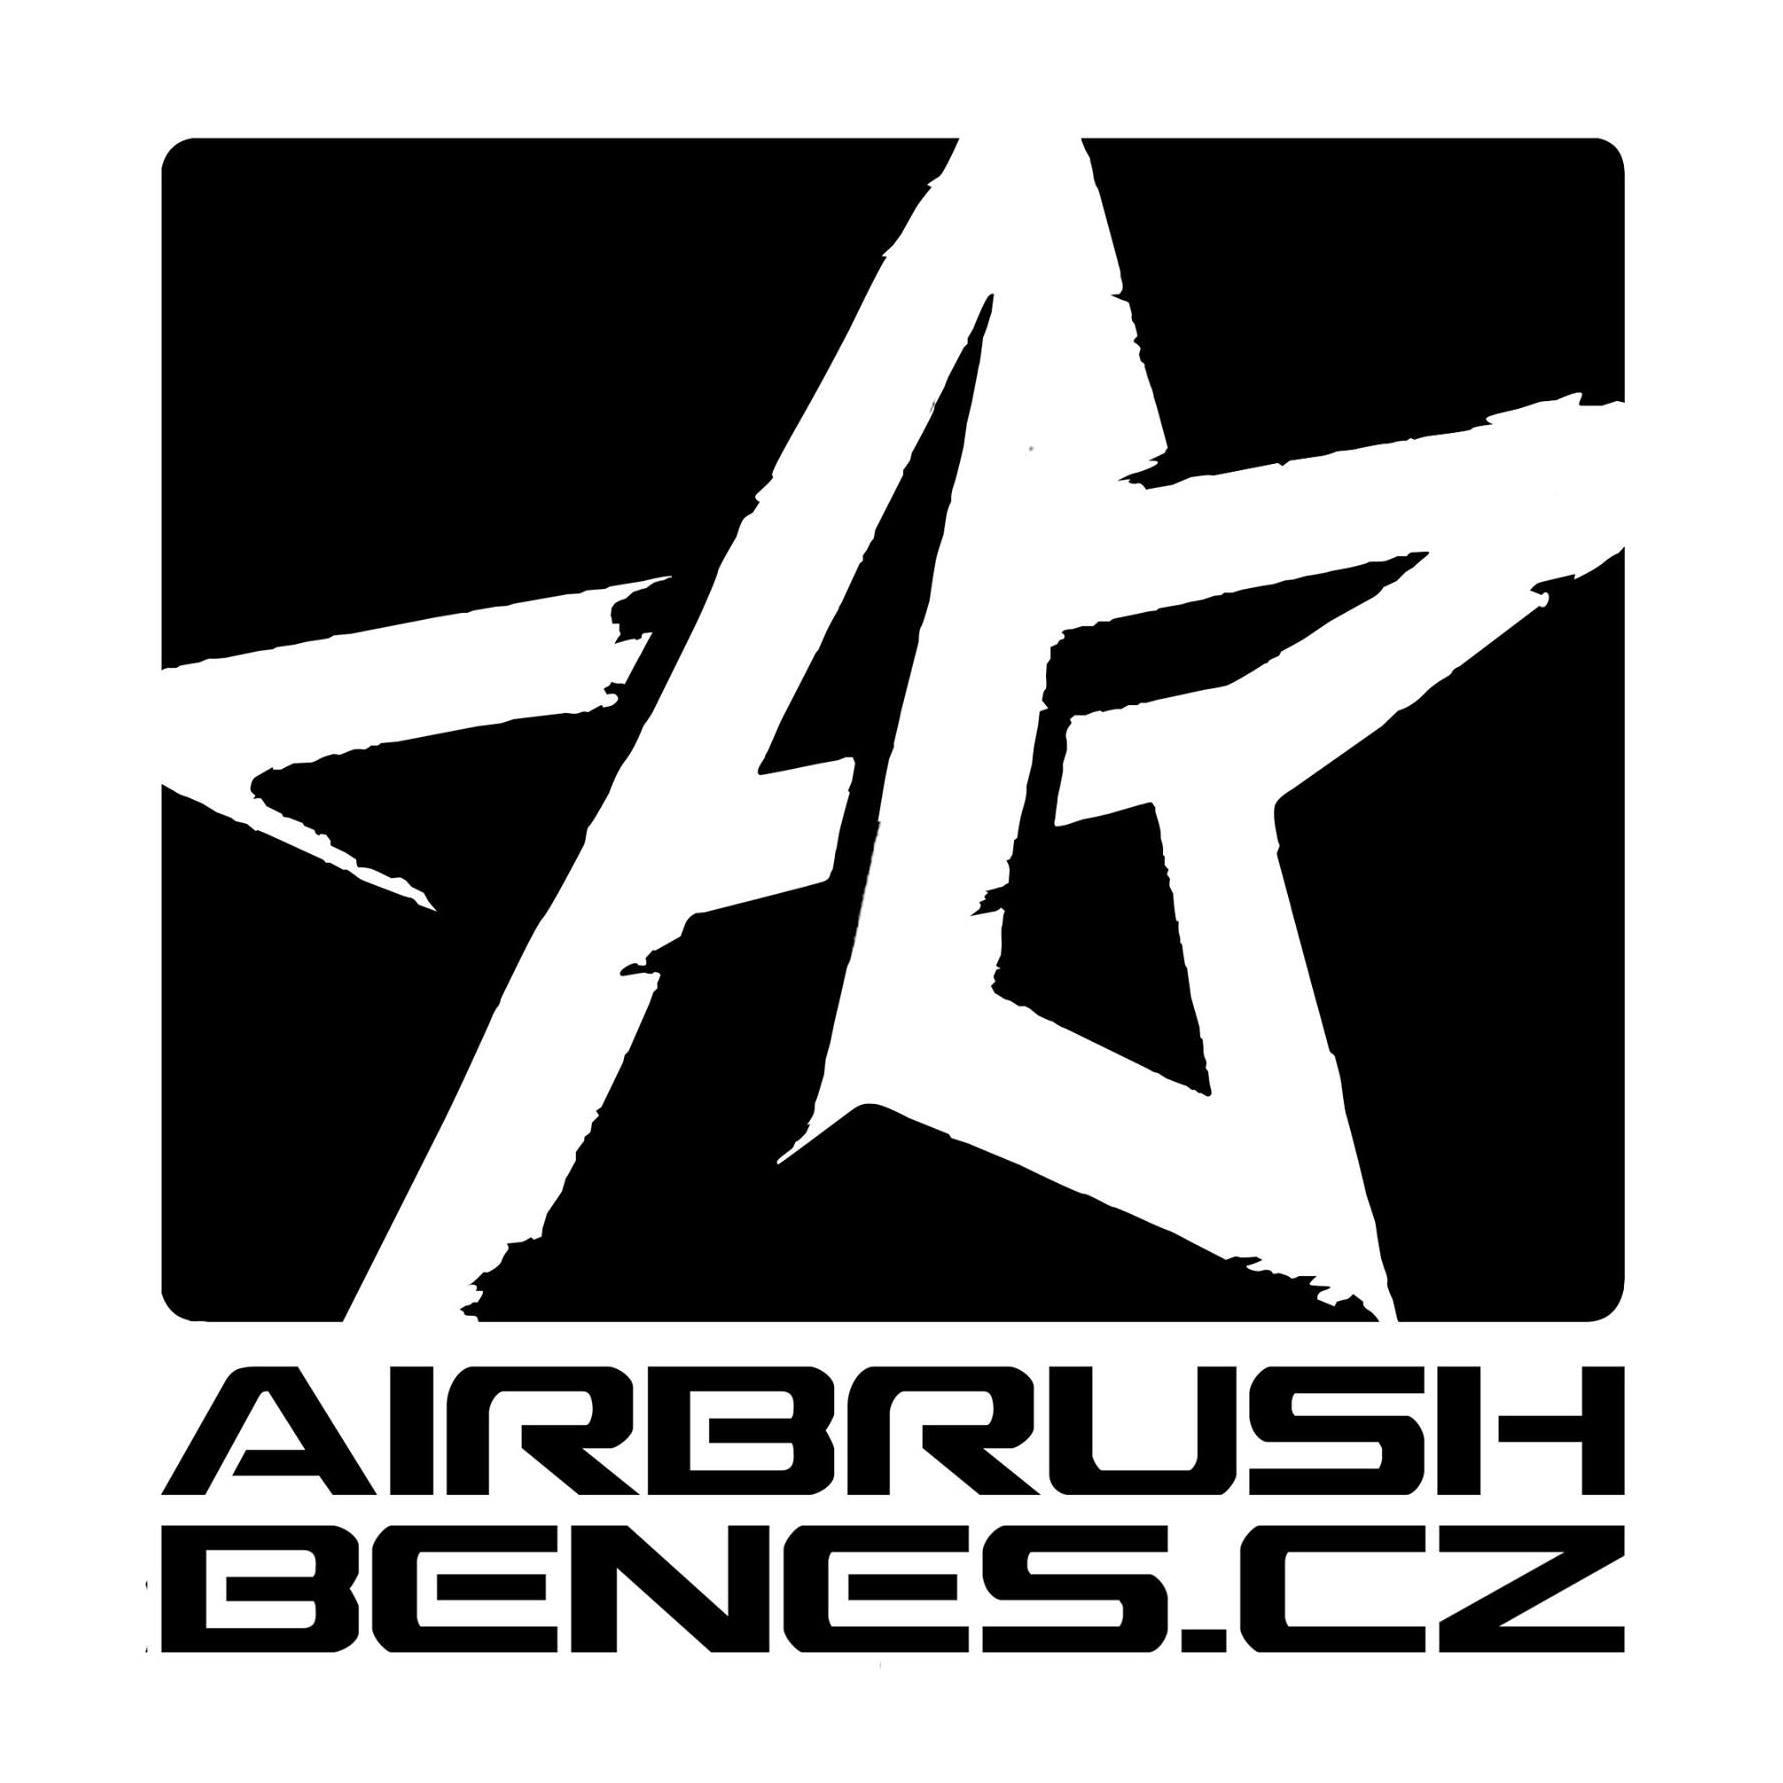 AIRBRUSHBENES.CZ